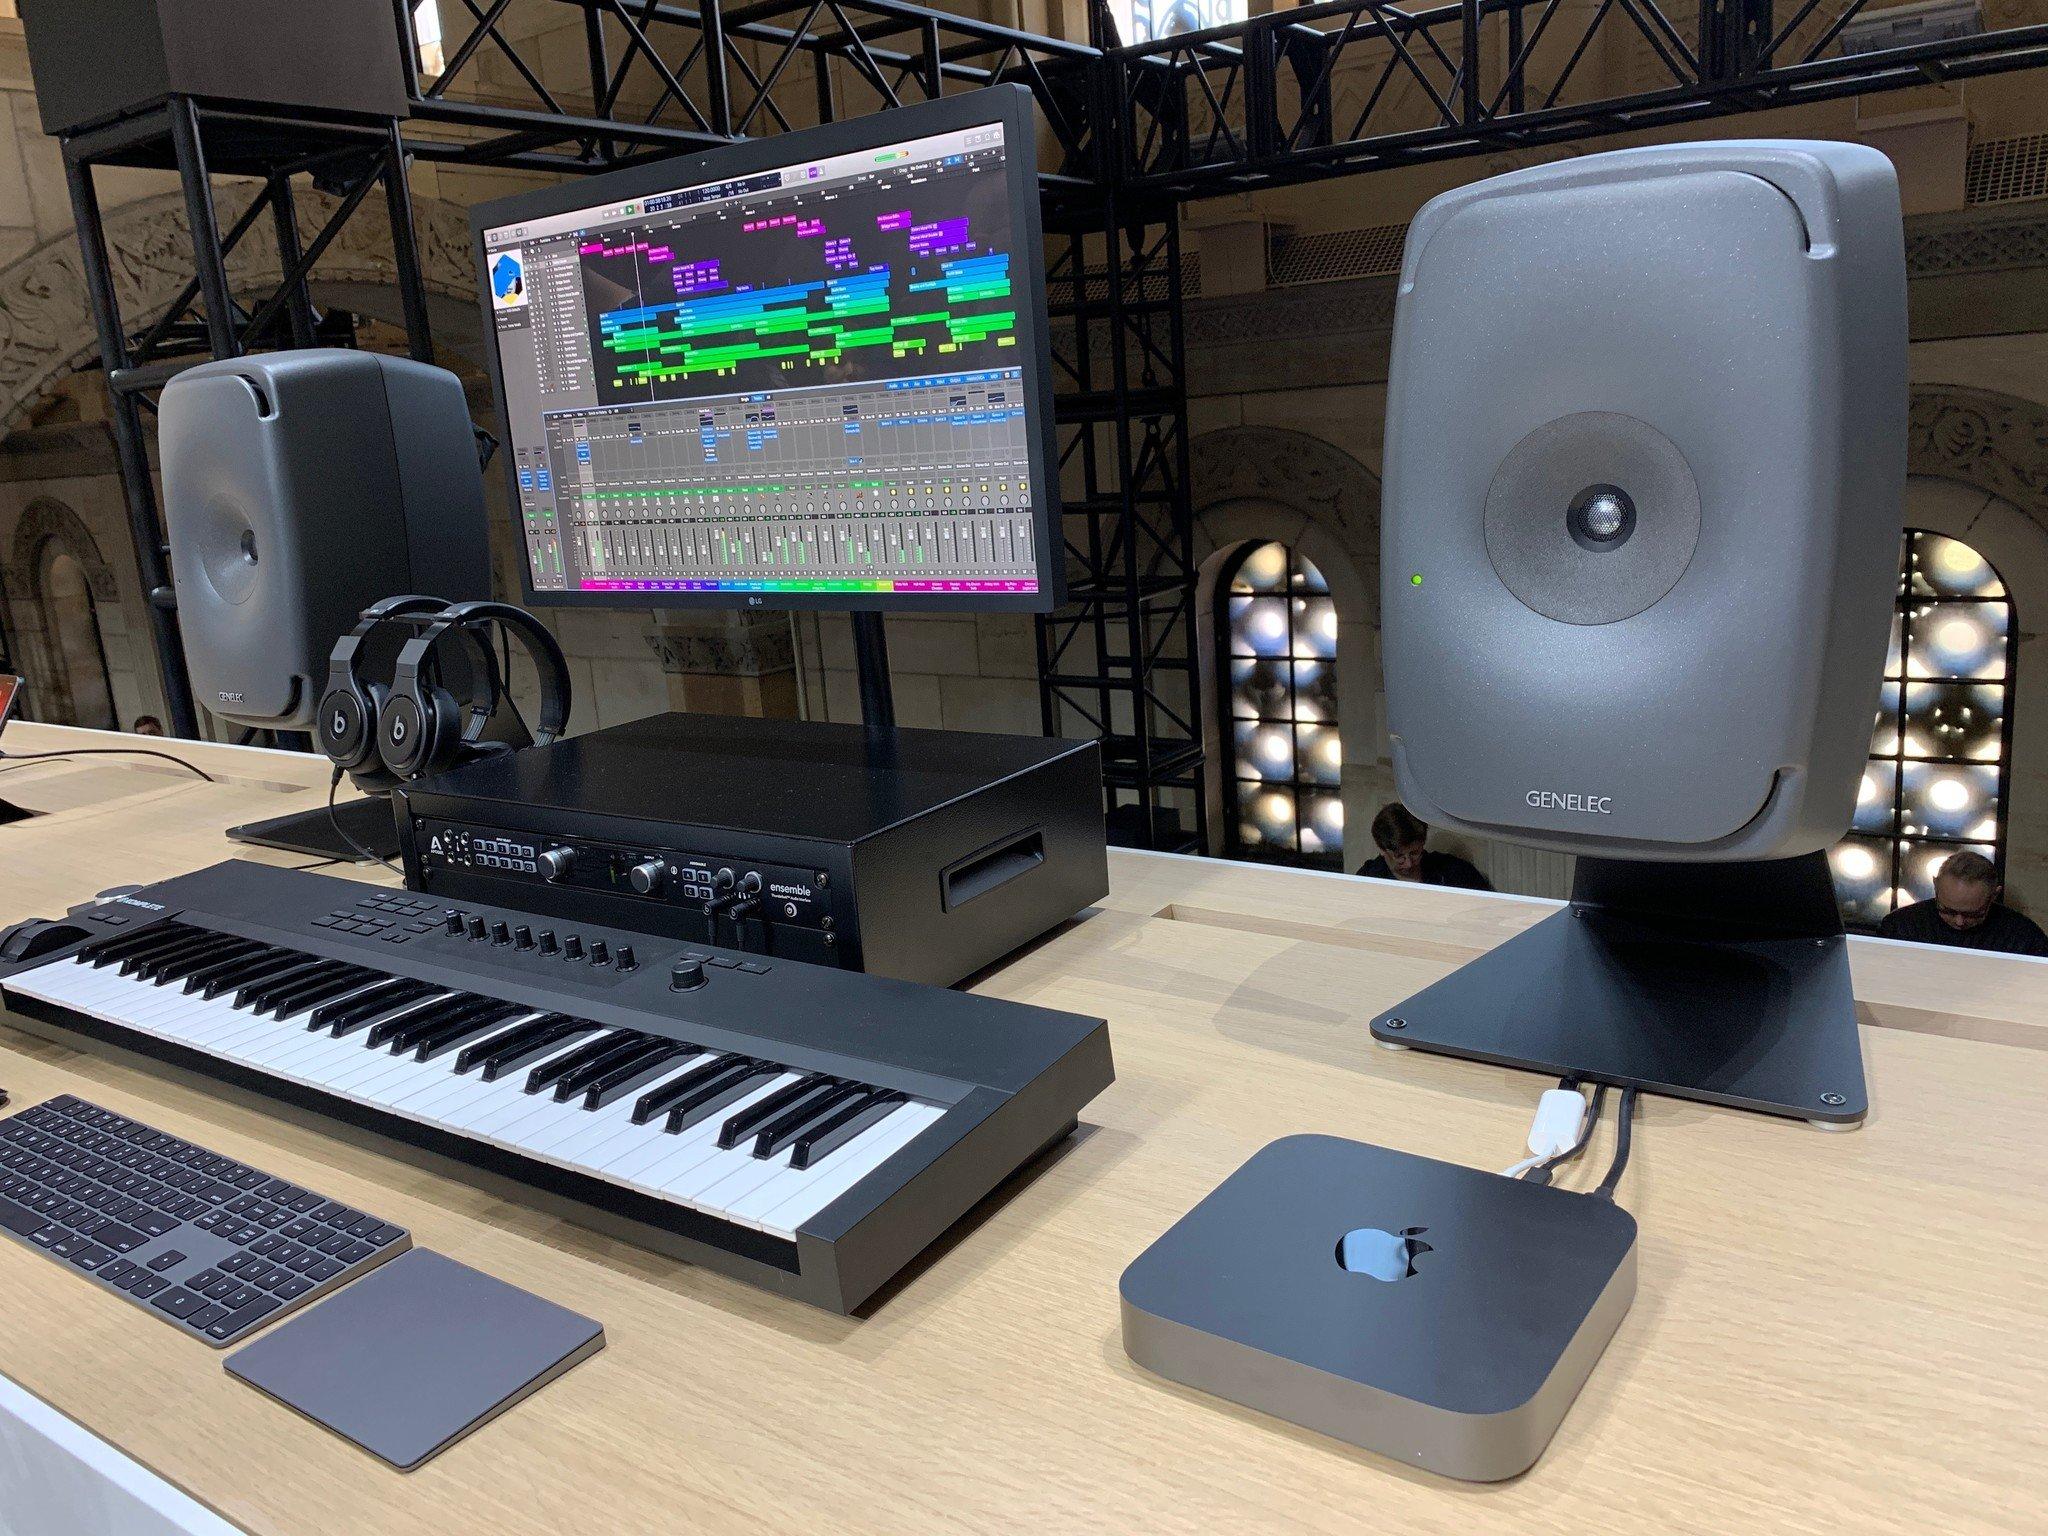 new mac mini 2018 hands on video imore